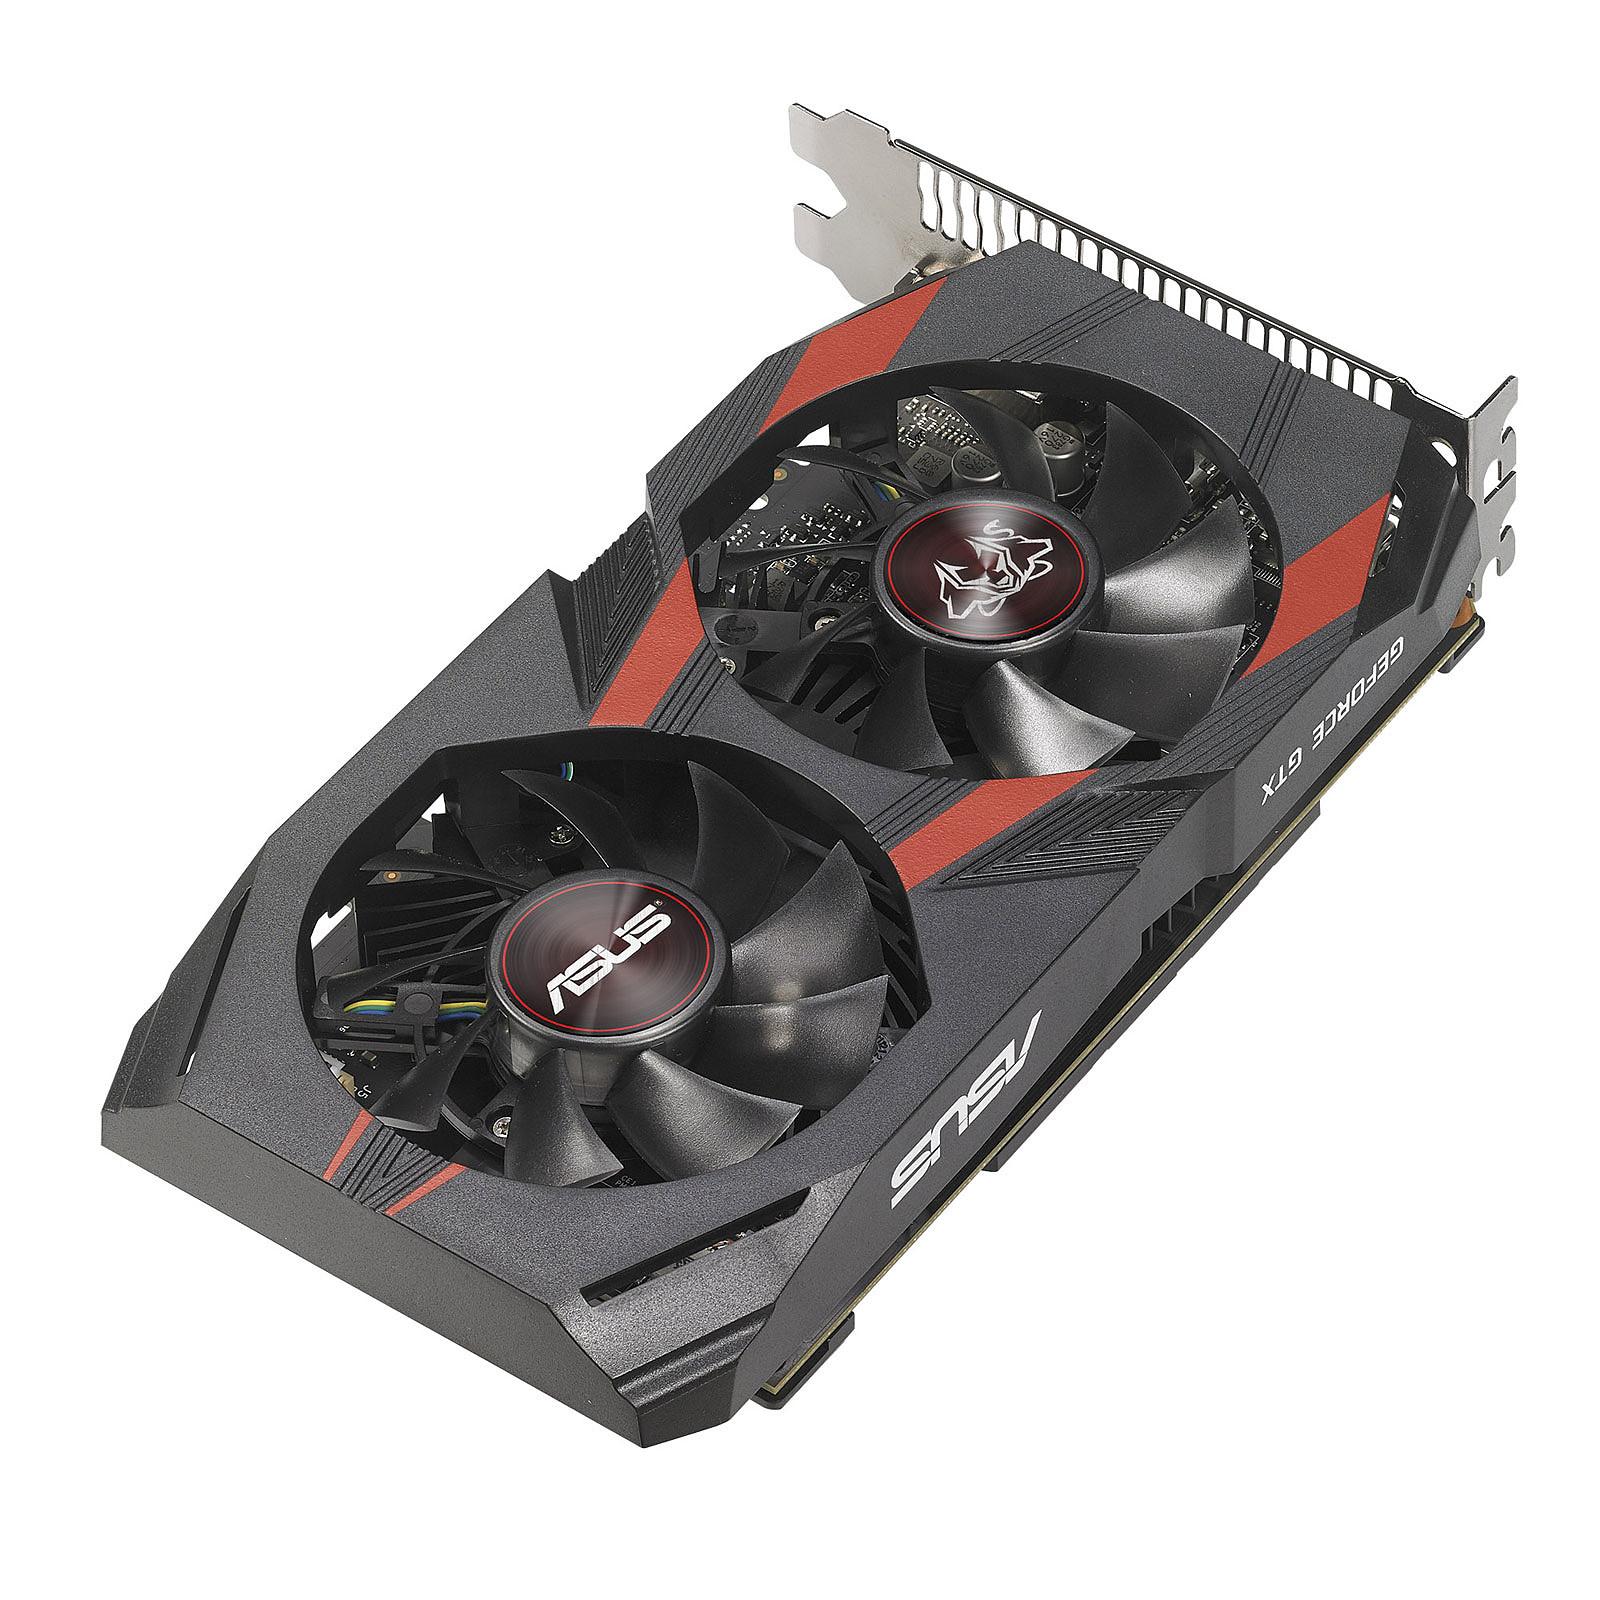 ASUS GeForce GTX 1050 Ti CERBERUS-GTX1050TI-O4G